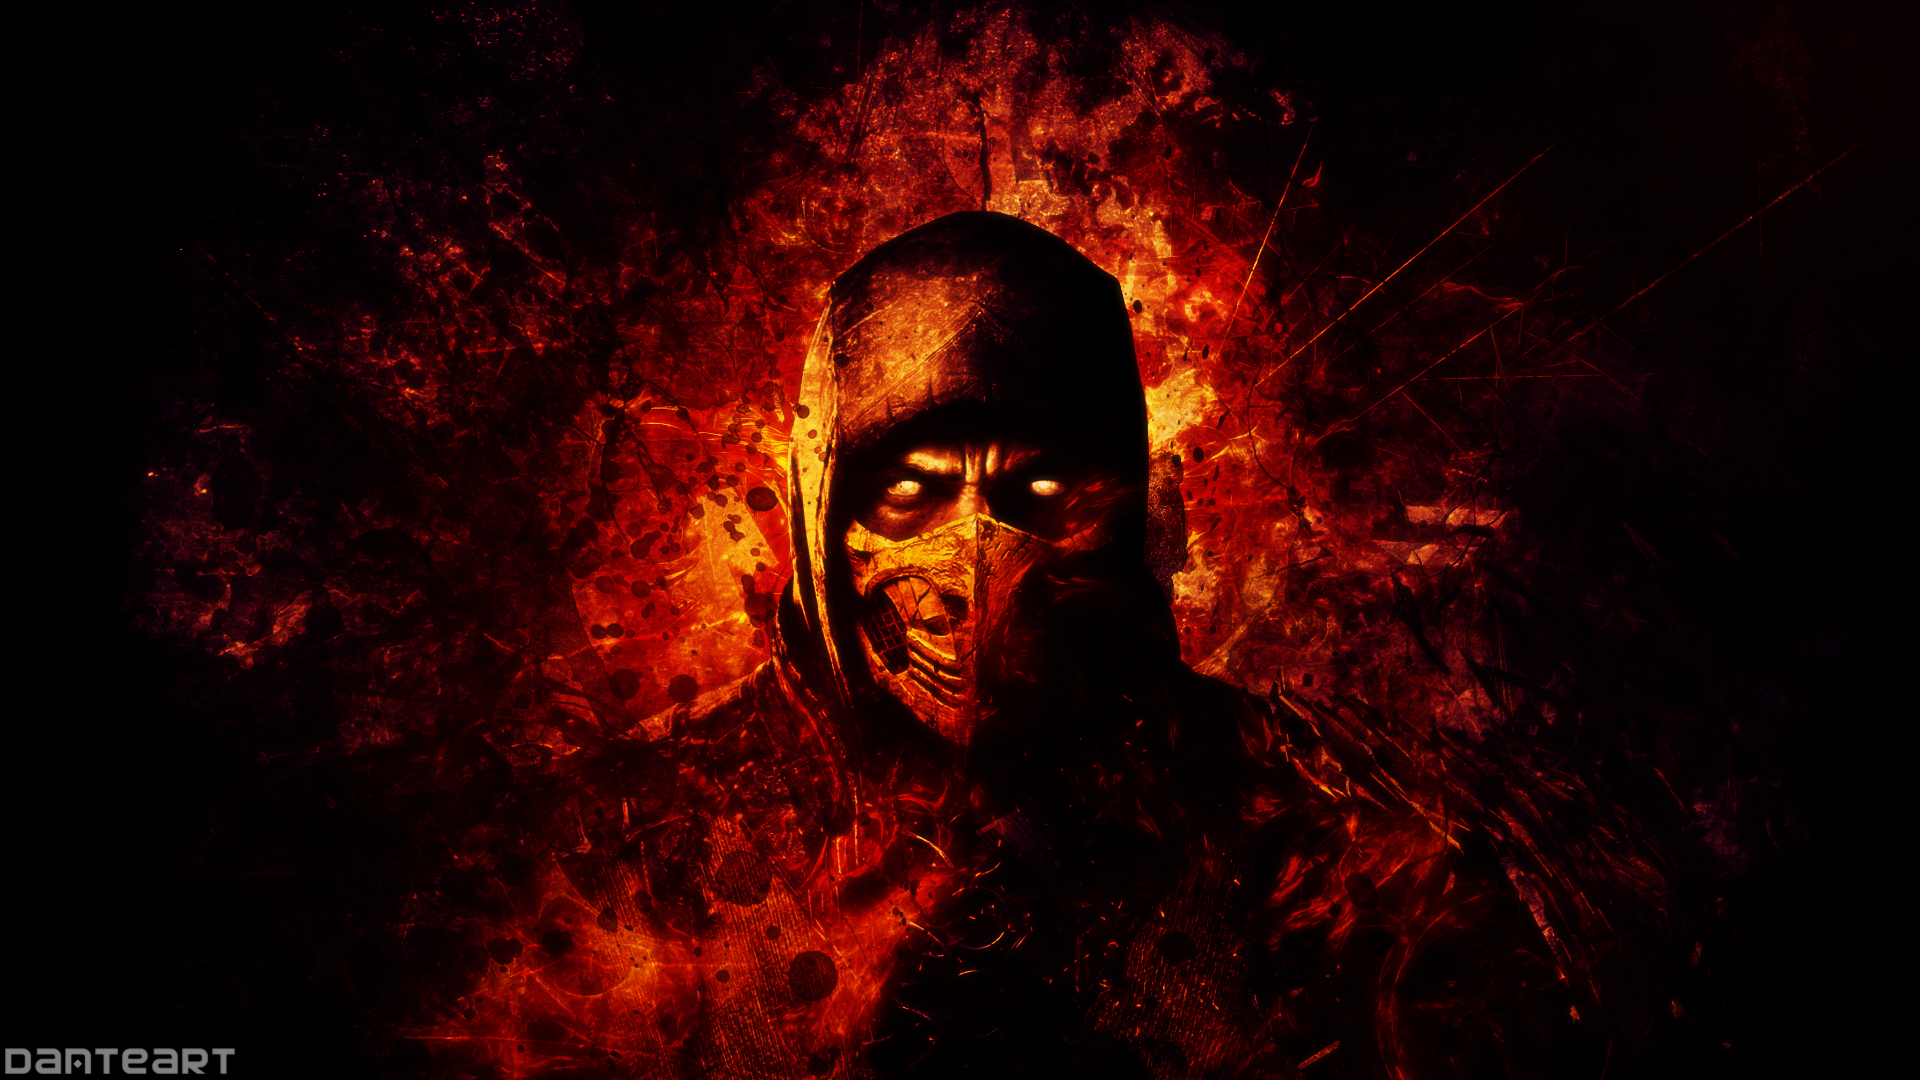 Mortal Kombat X Scorpion Wallpaper by DanteArtWallpapers 1920x1080